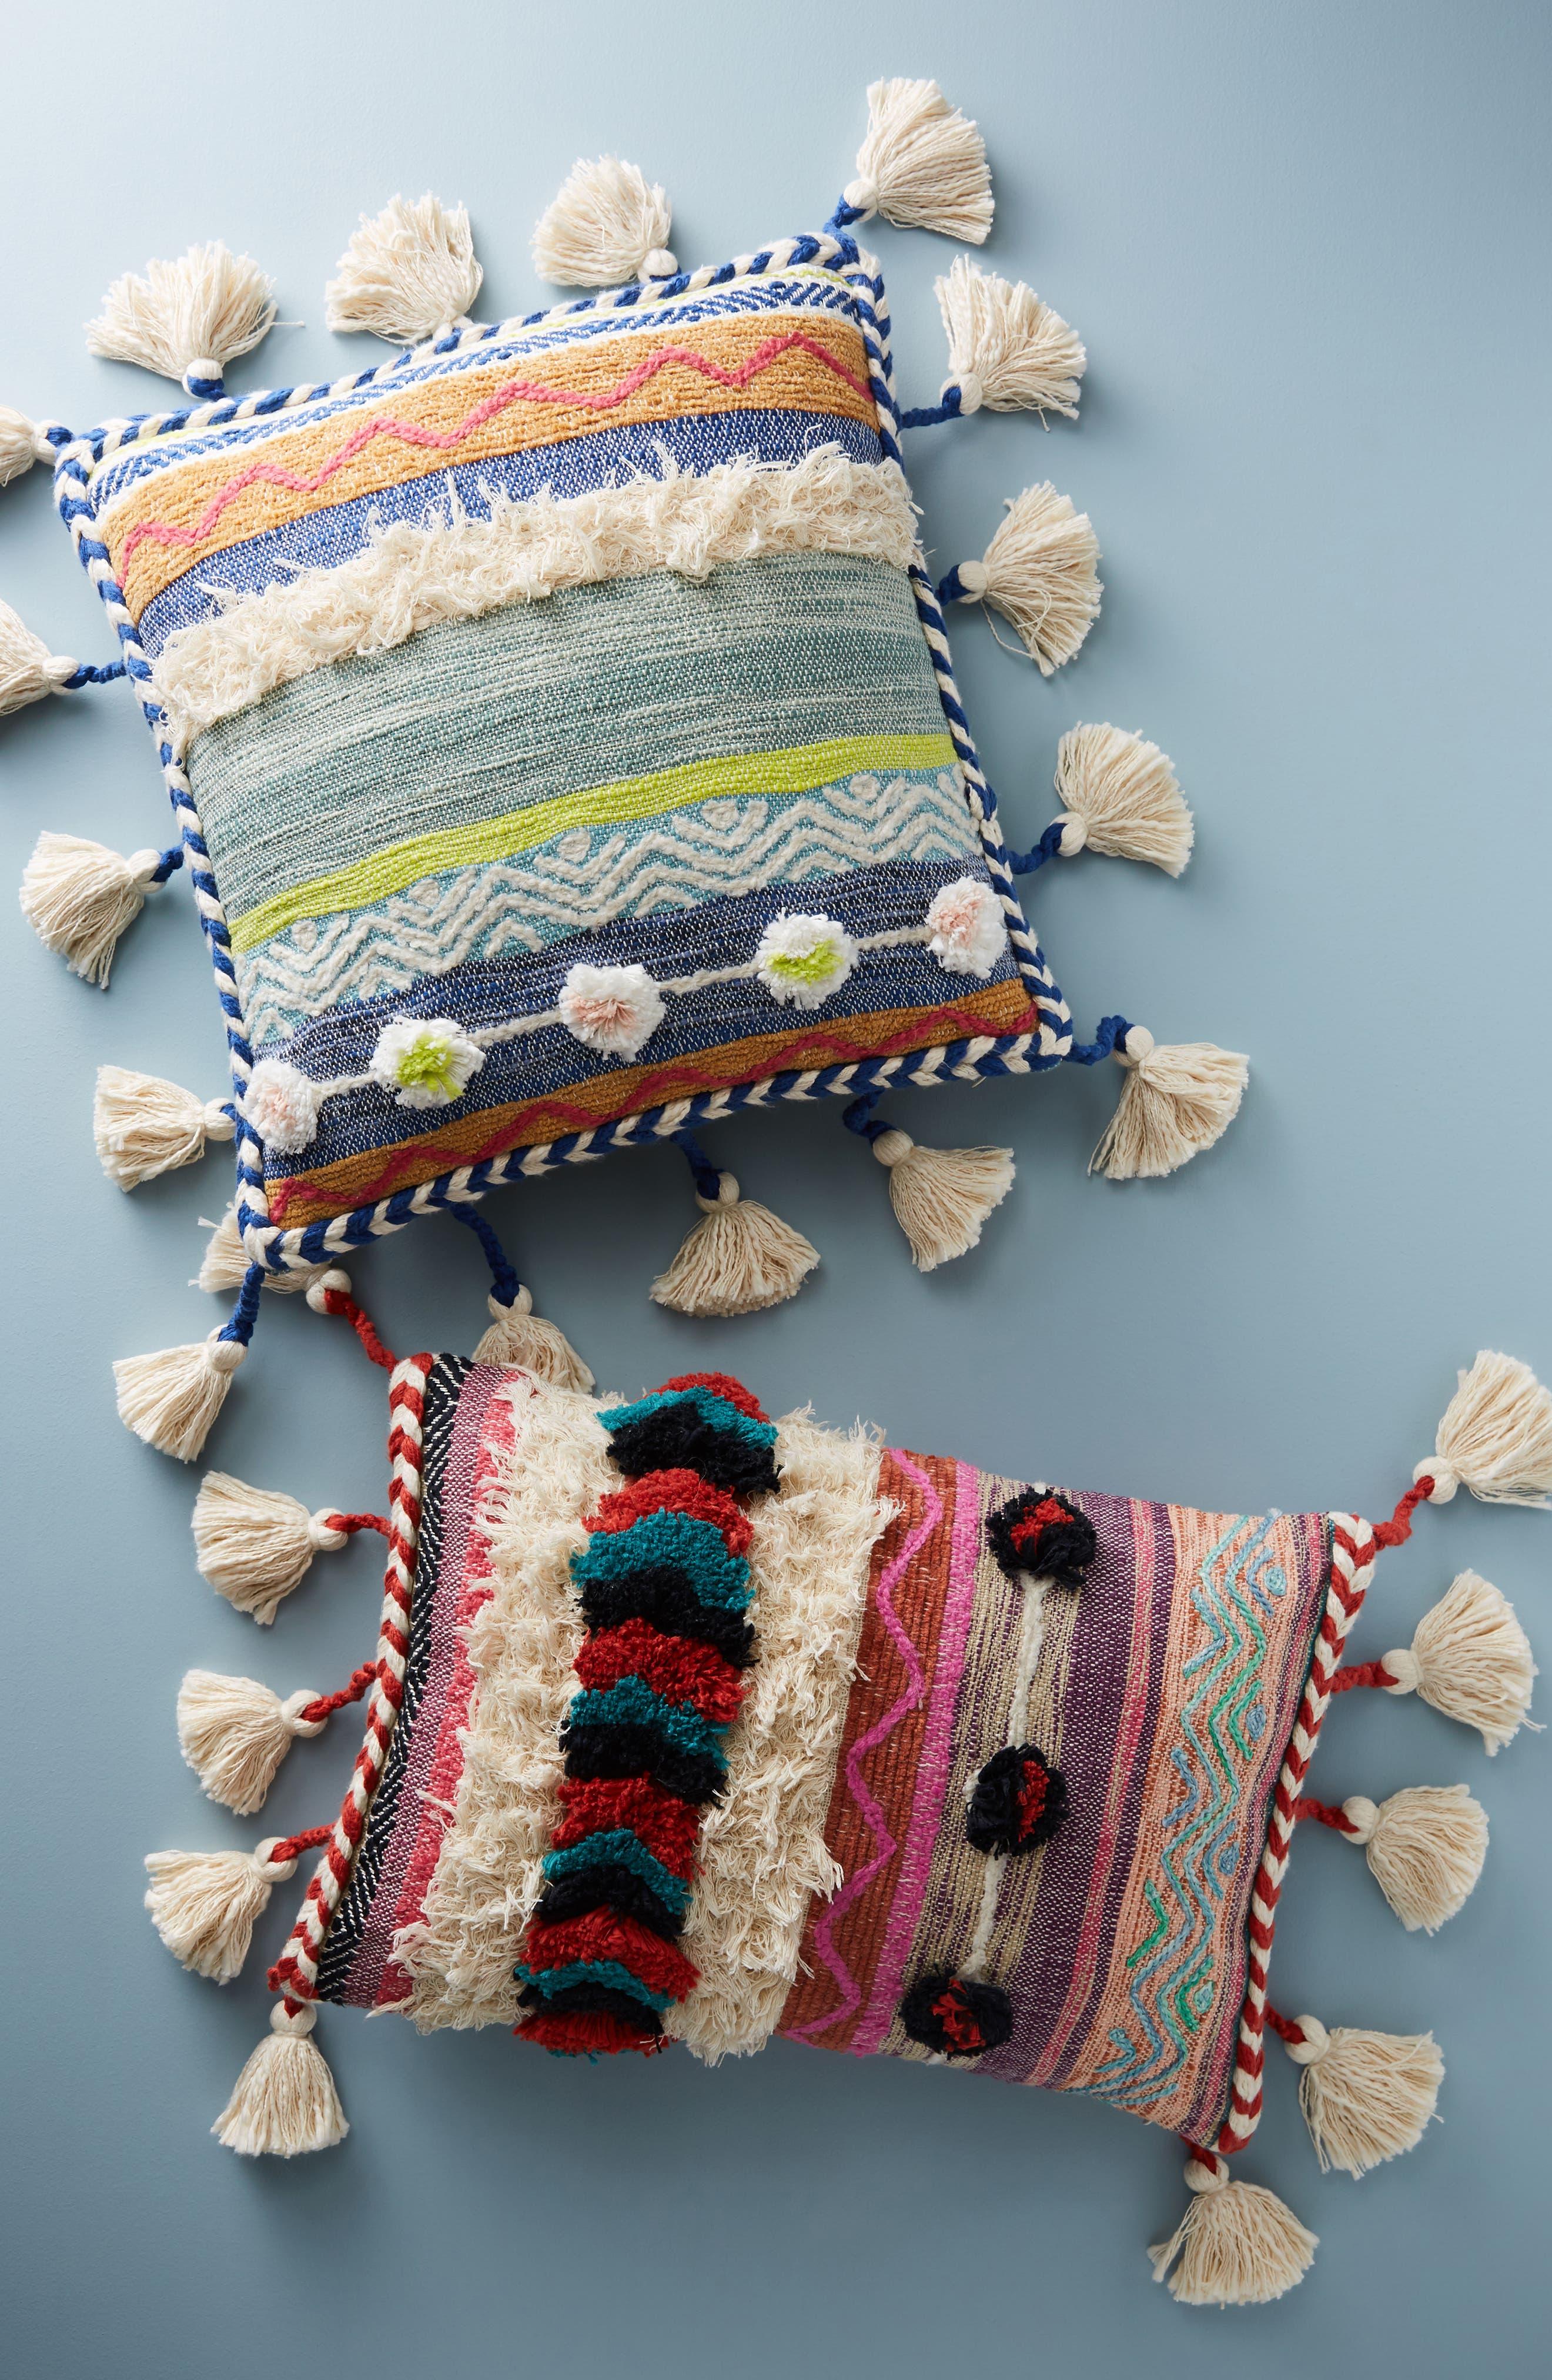 Woven Rami Accent Pillow,                             Alternate thumbnail 4, color,                             Blue Combo